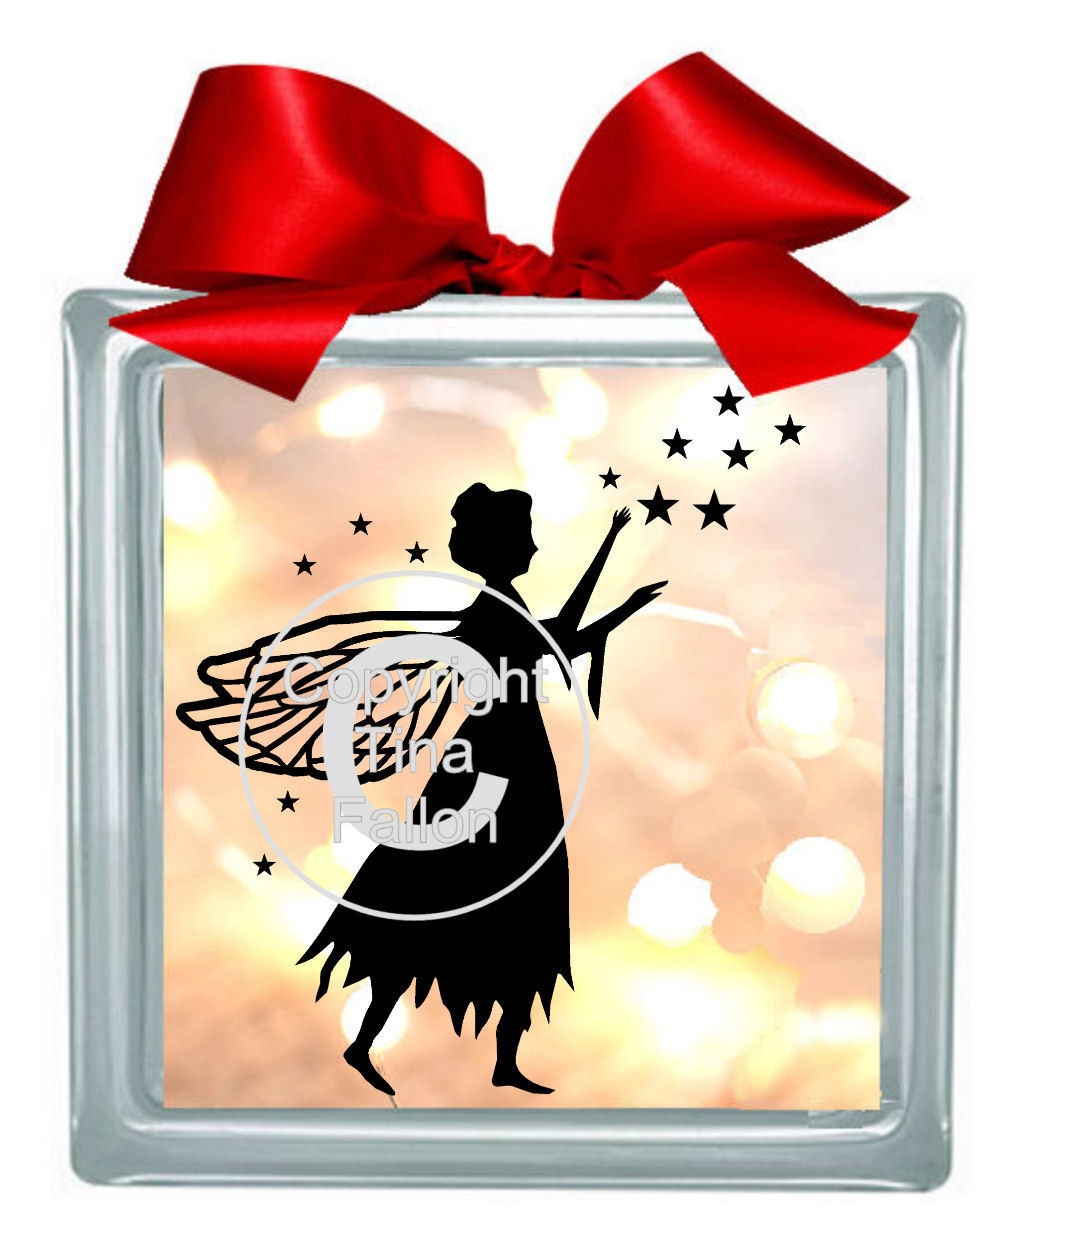 Fairy Stars No 2 for vinyl, cards,glass blocks